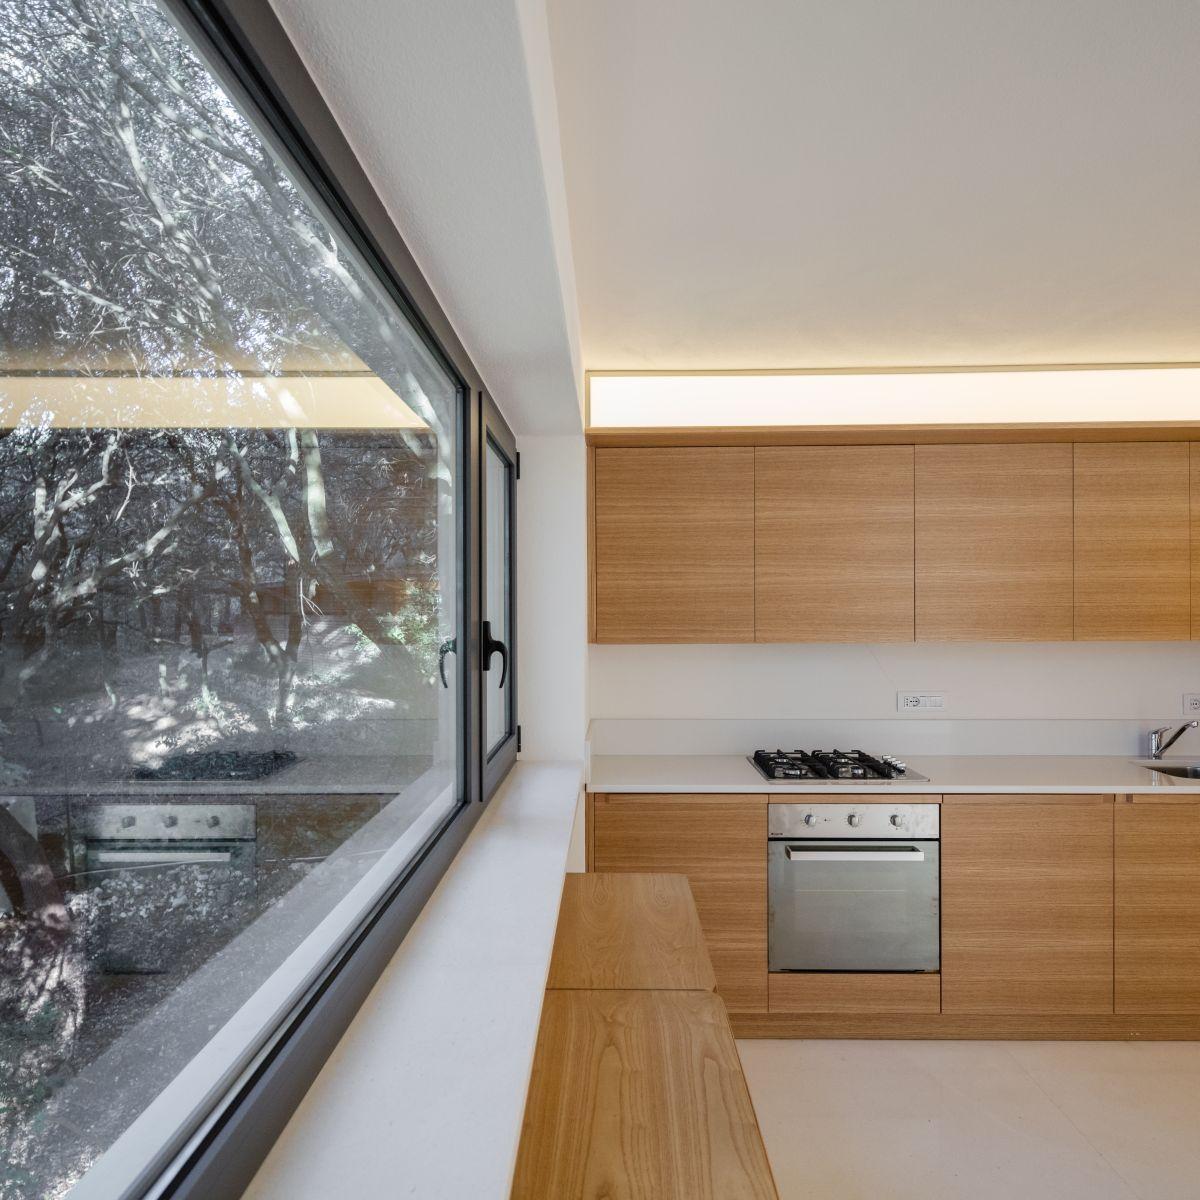 Casa nel Bosco kitchen view